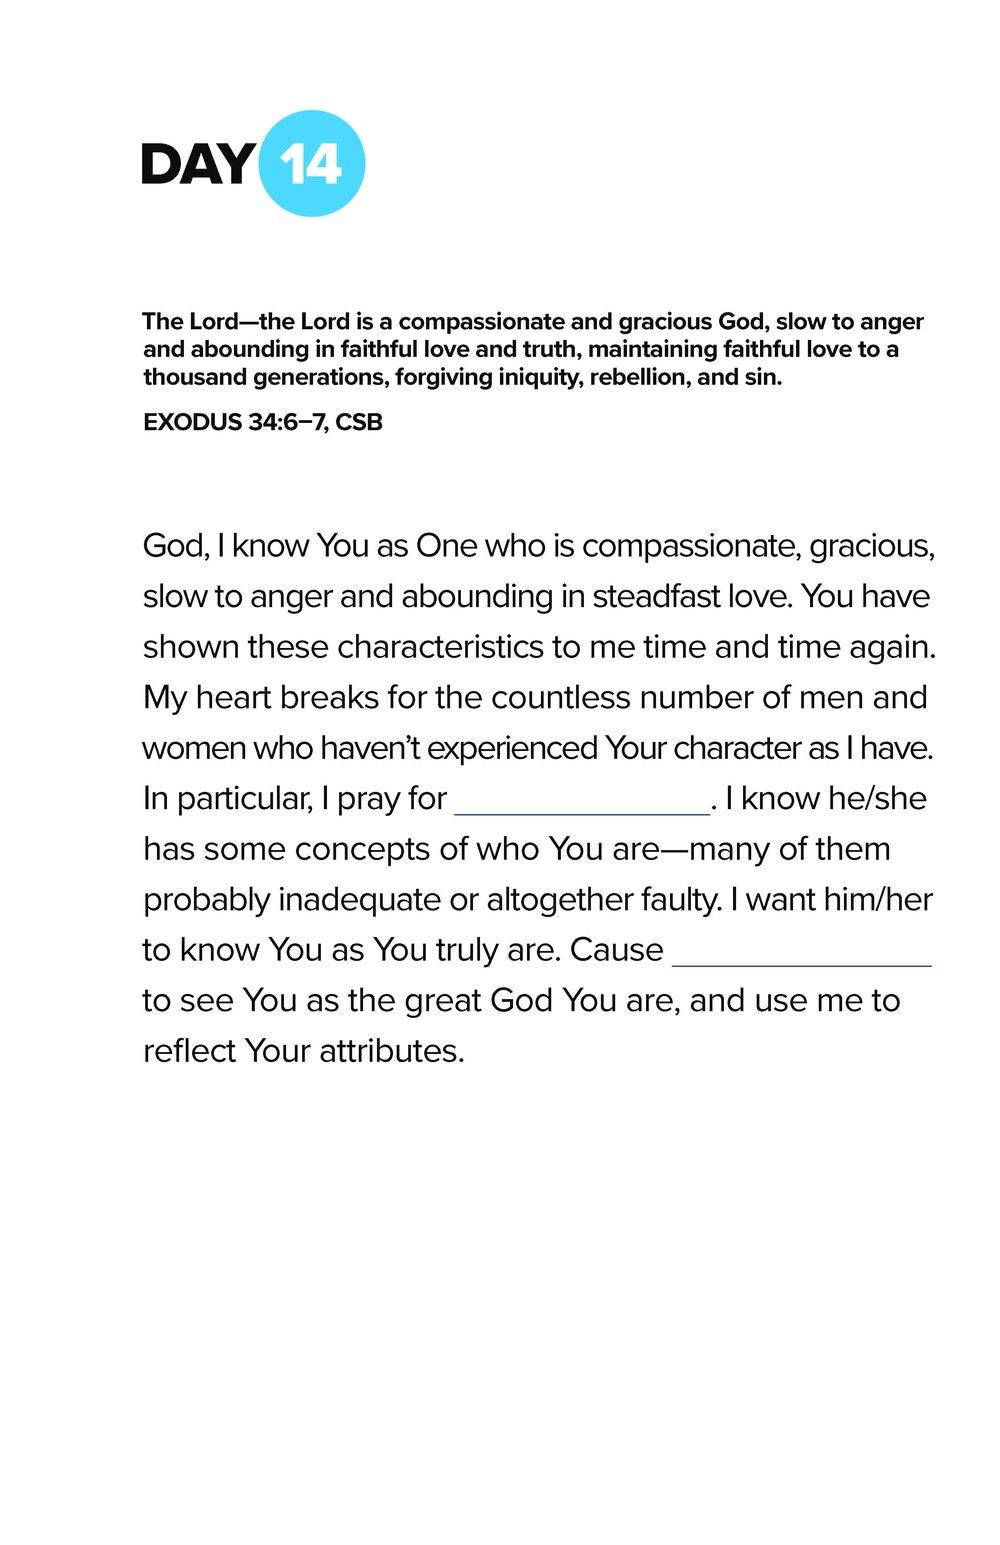 WhosYour1_Prayer-Guide_day14.jpg